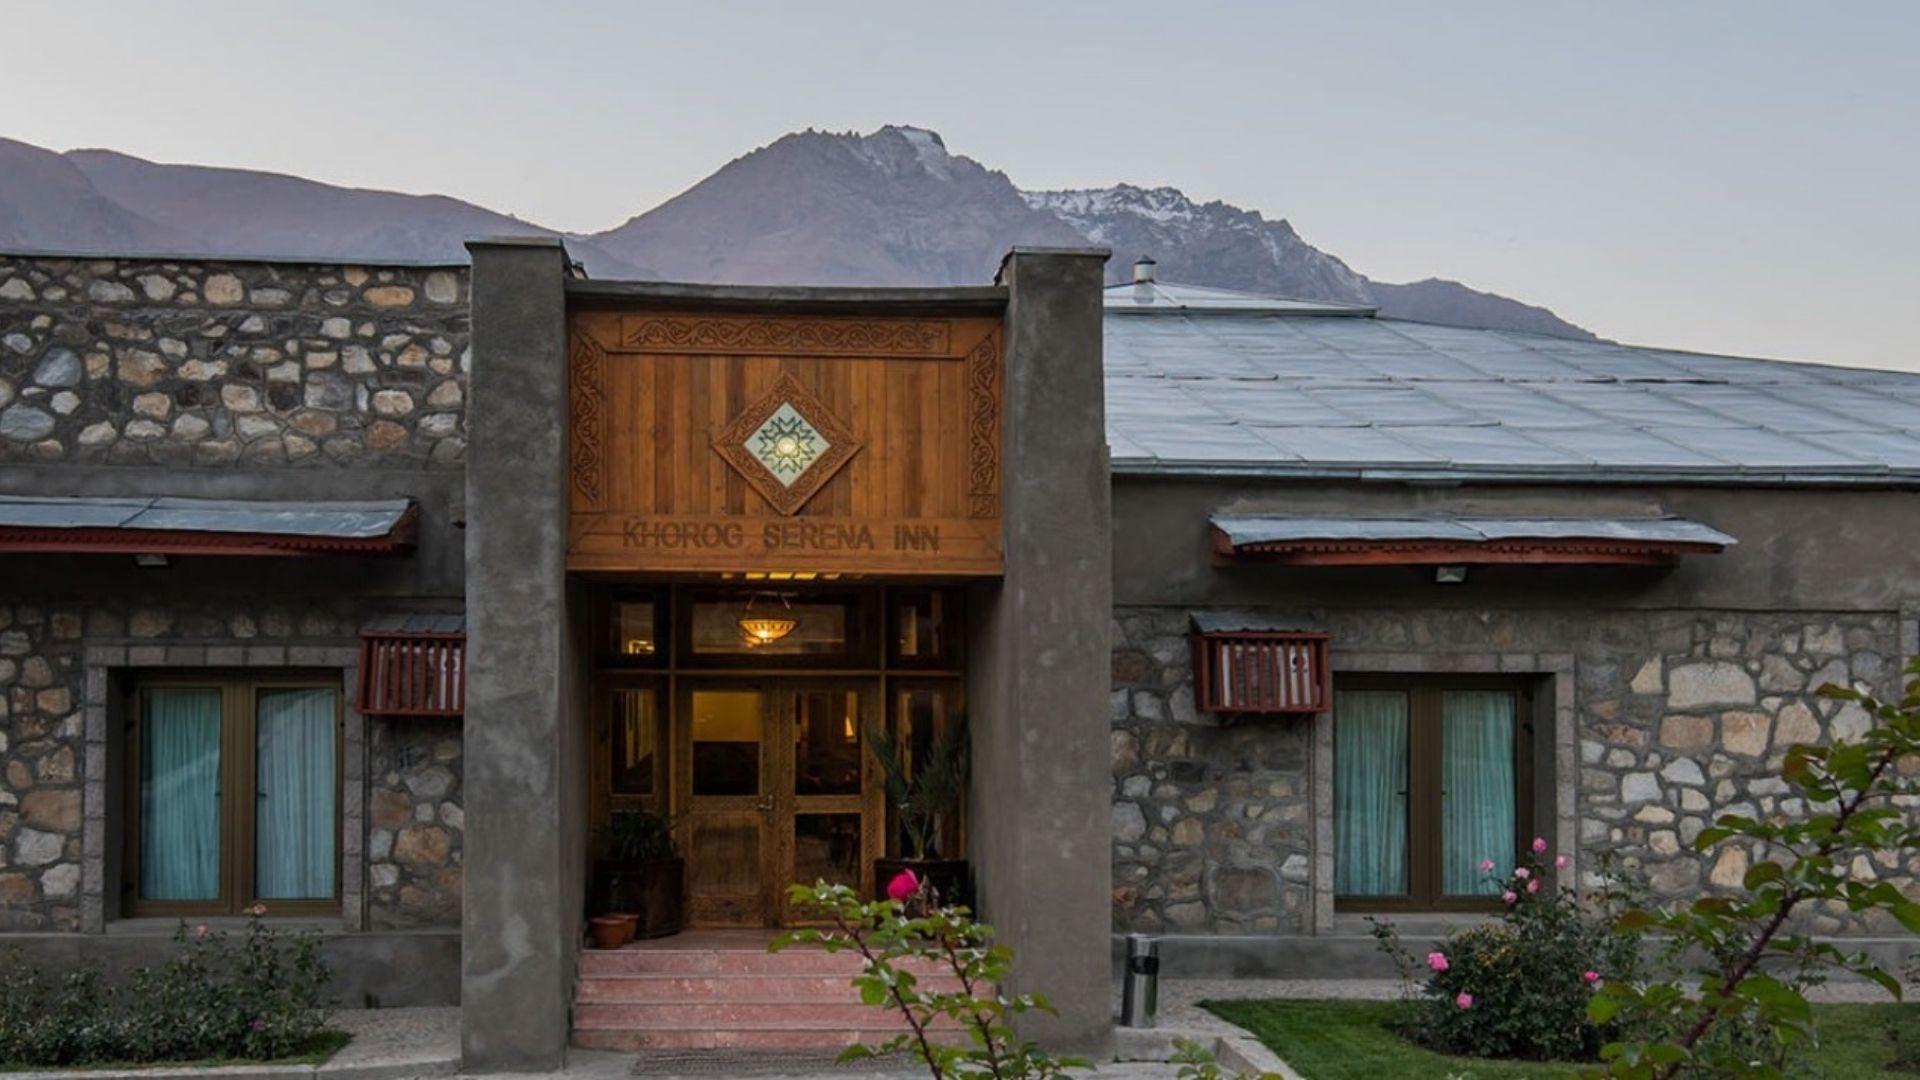 Serena Inn at Khorog